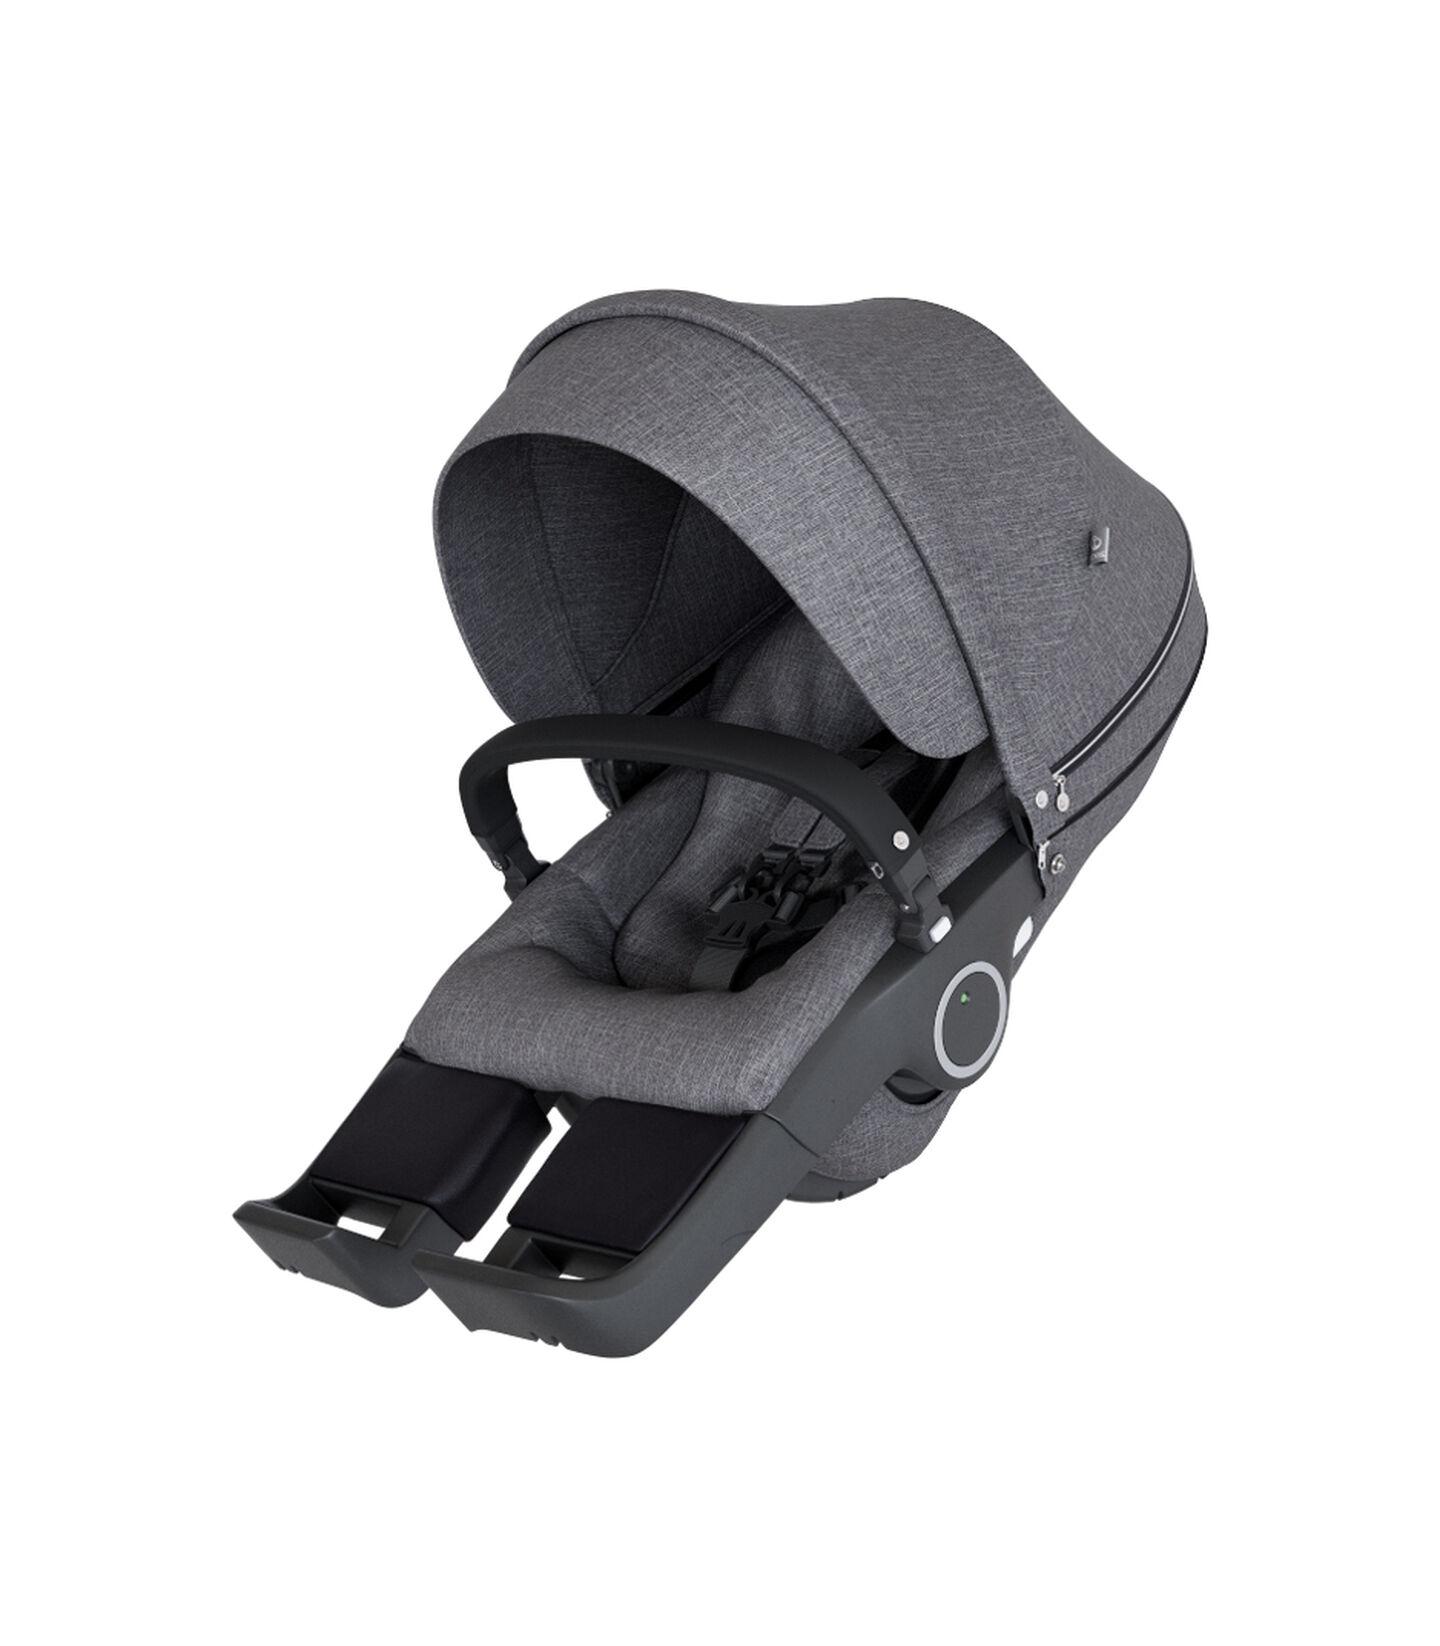 Stokke® Stroller Seat Black Melange, Black Melange, mainview view 2